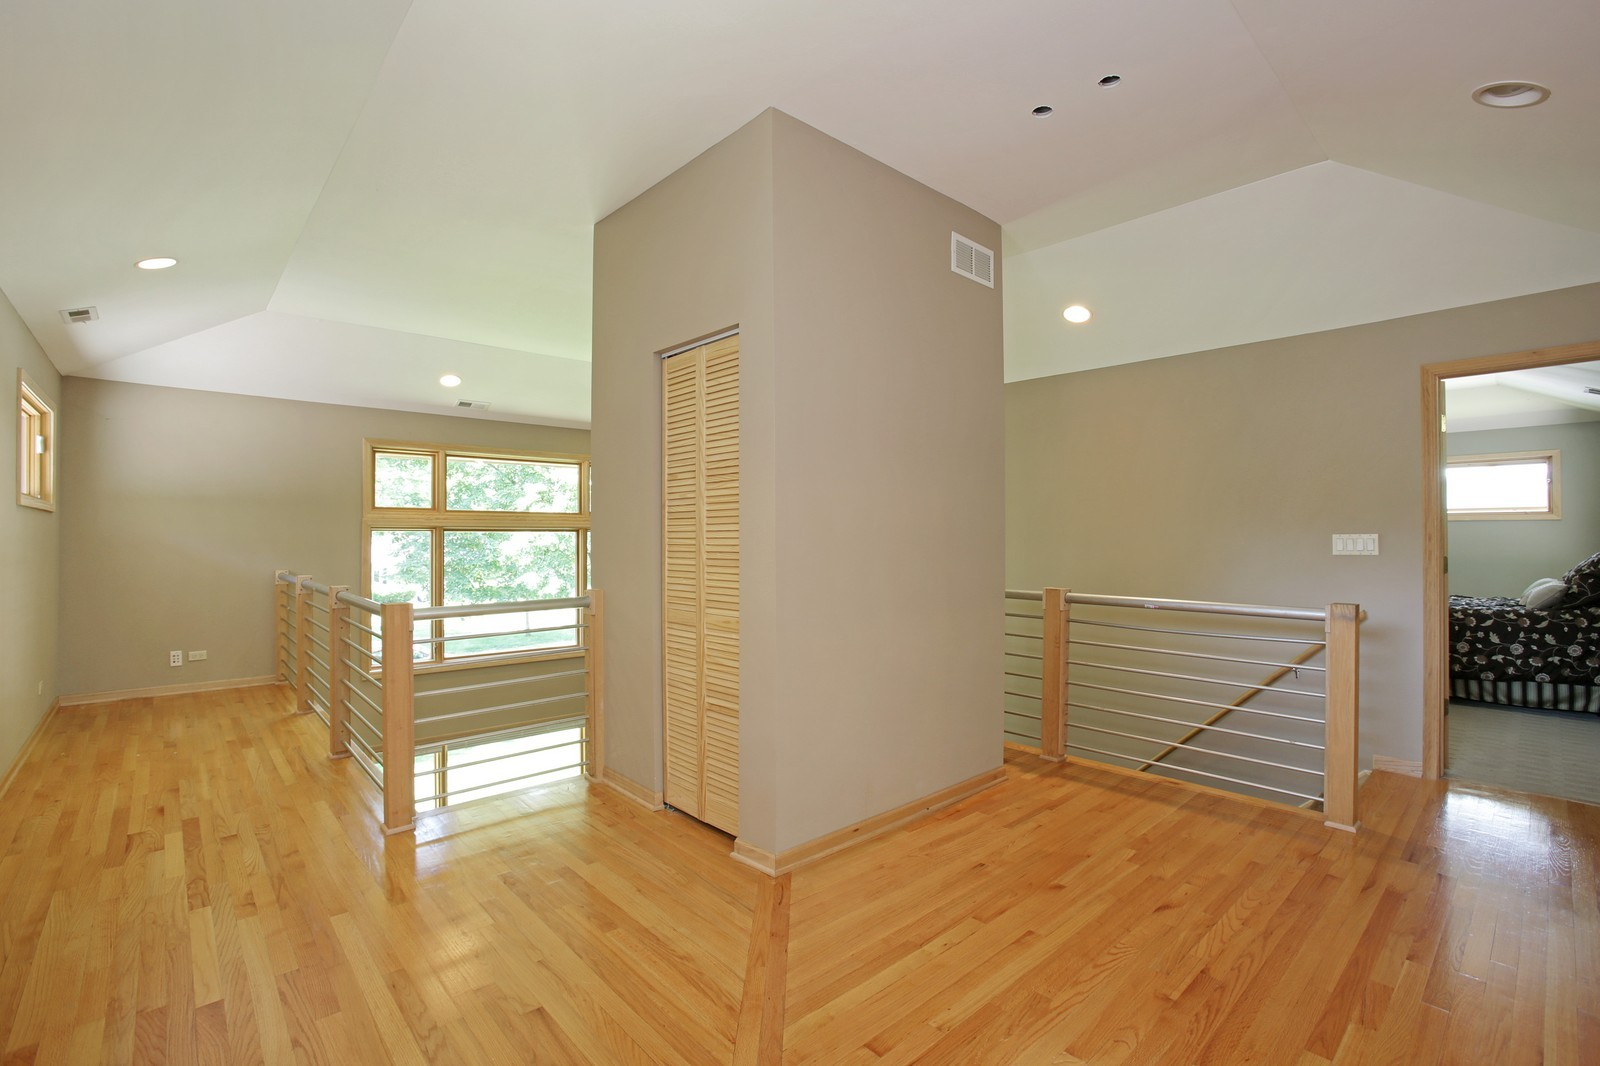 Real Estate Photography - 4107 Washington St, Downers Grove, IL, 60515 - Loft